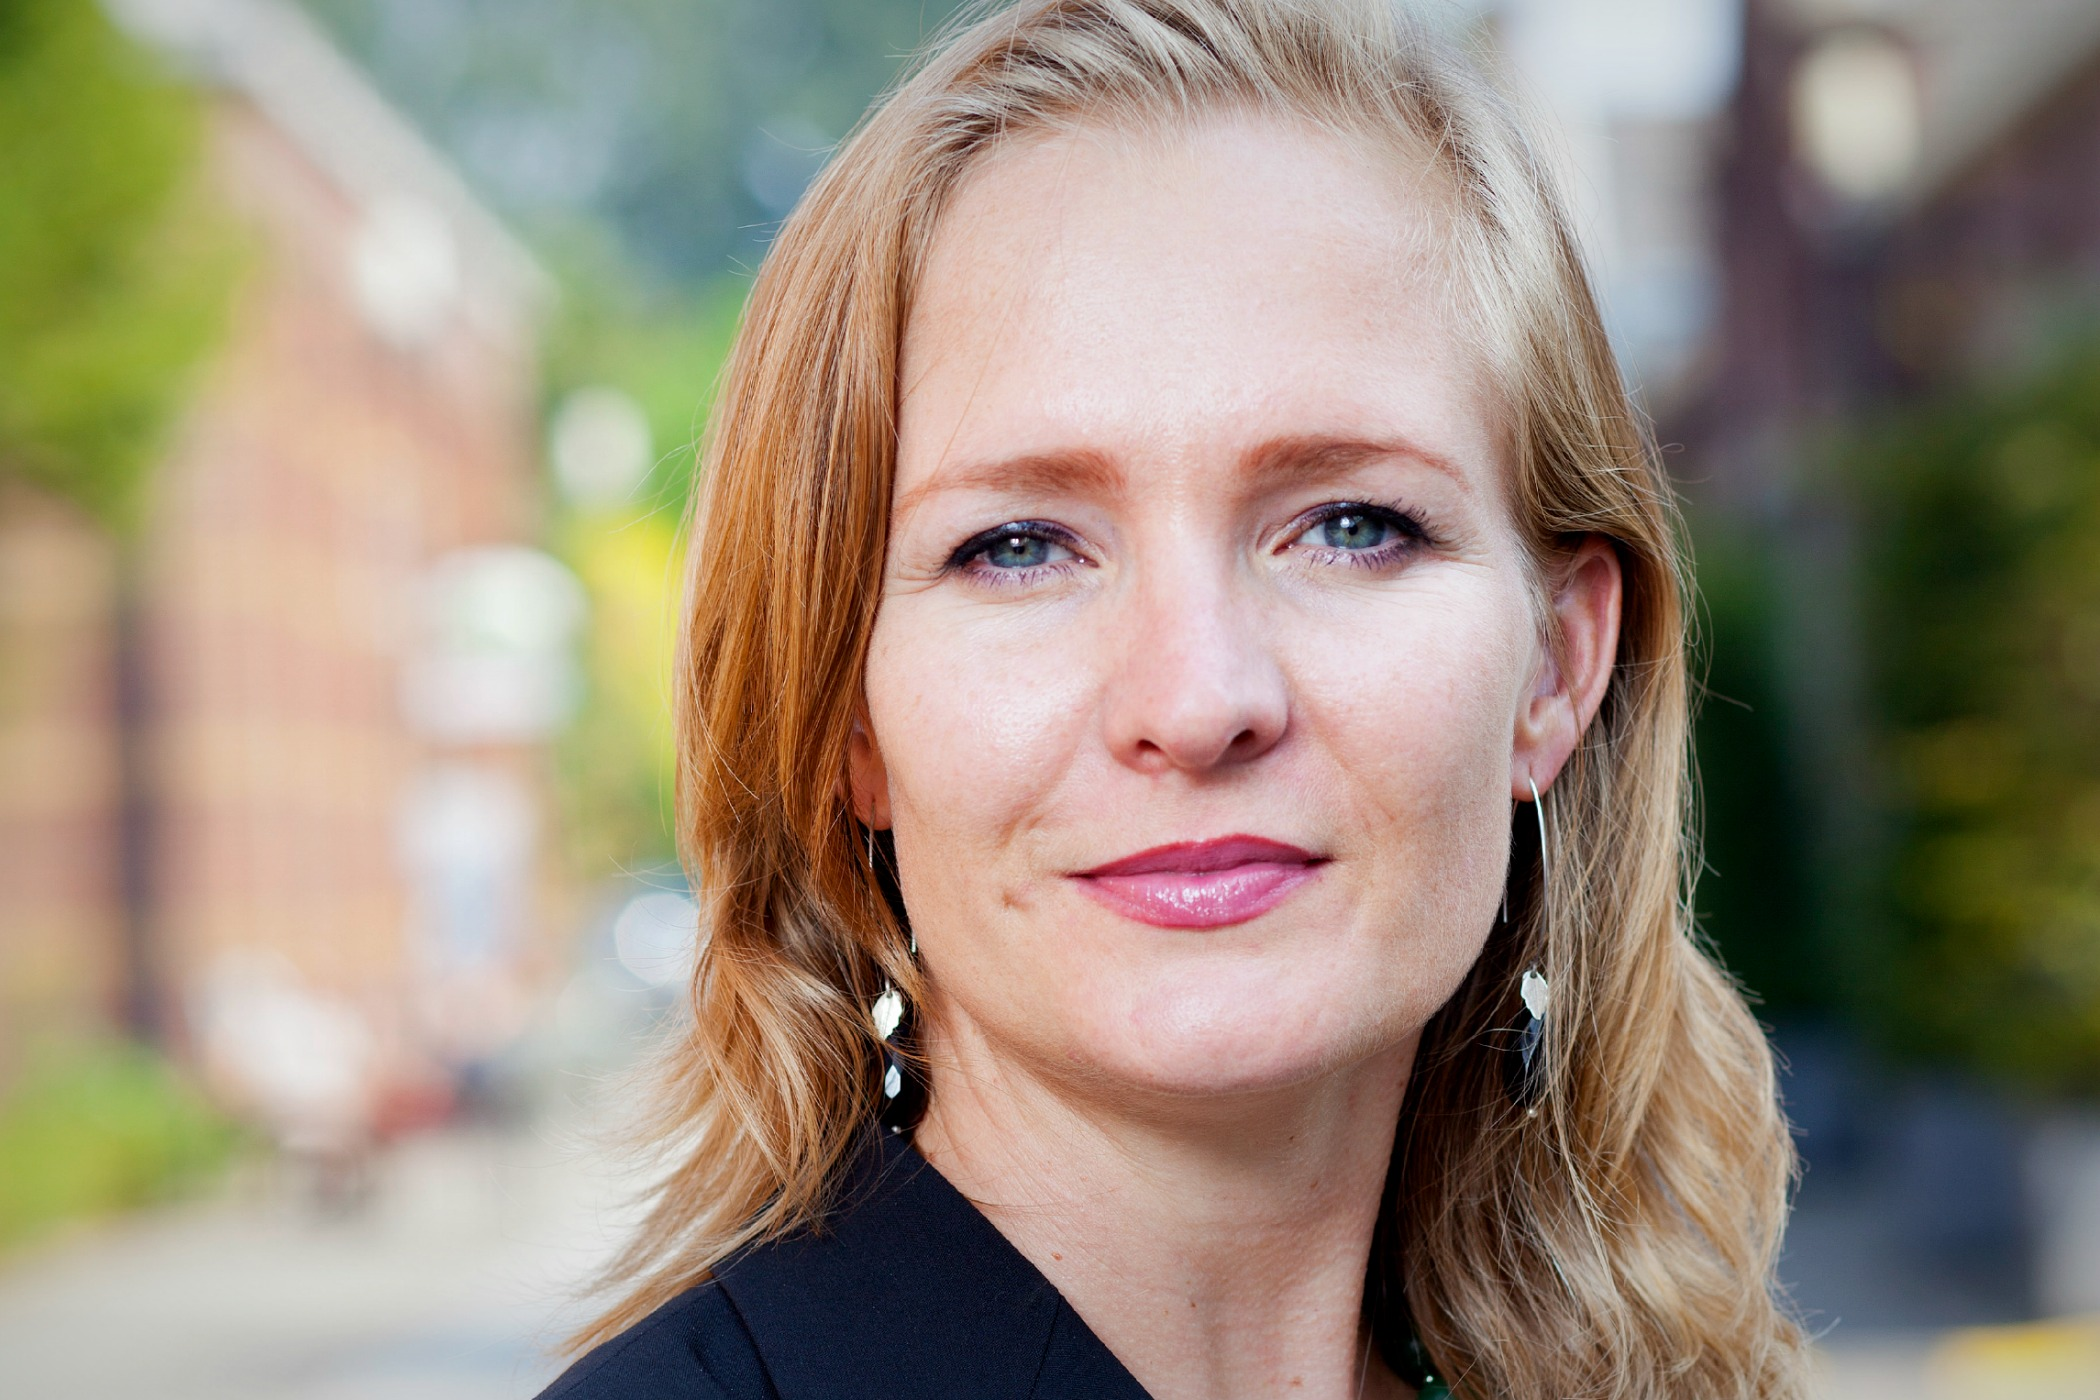 Marietje Schaake [Bram Belloni]